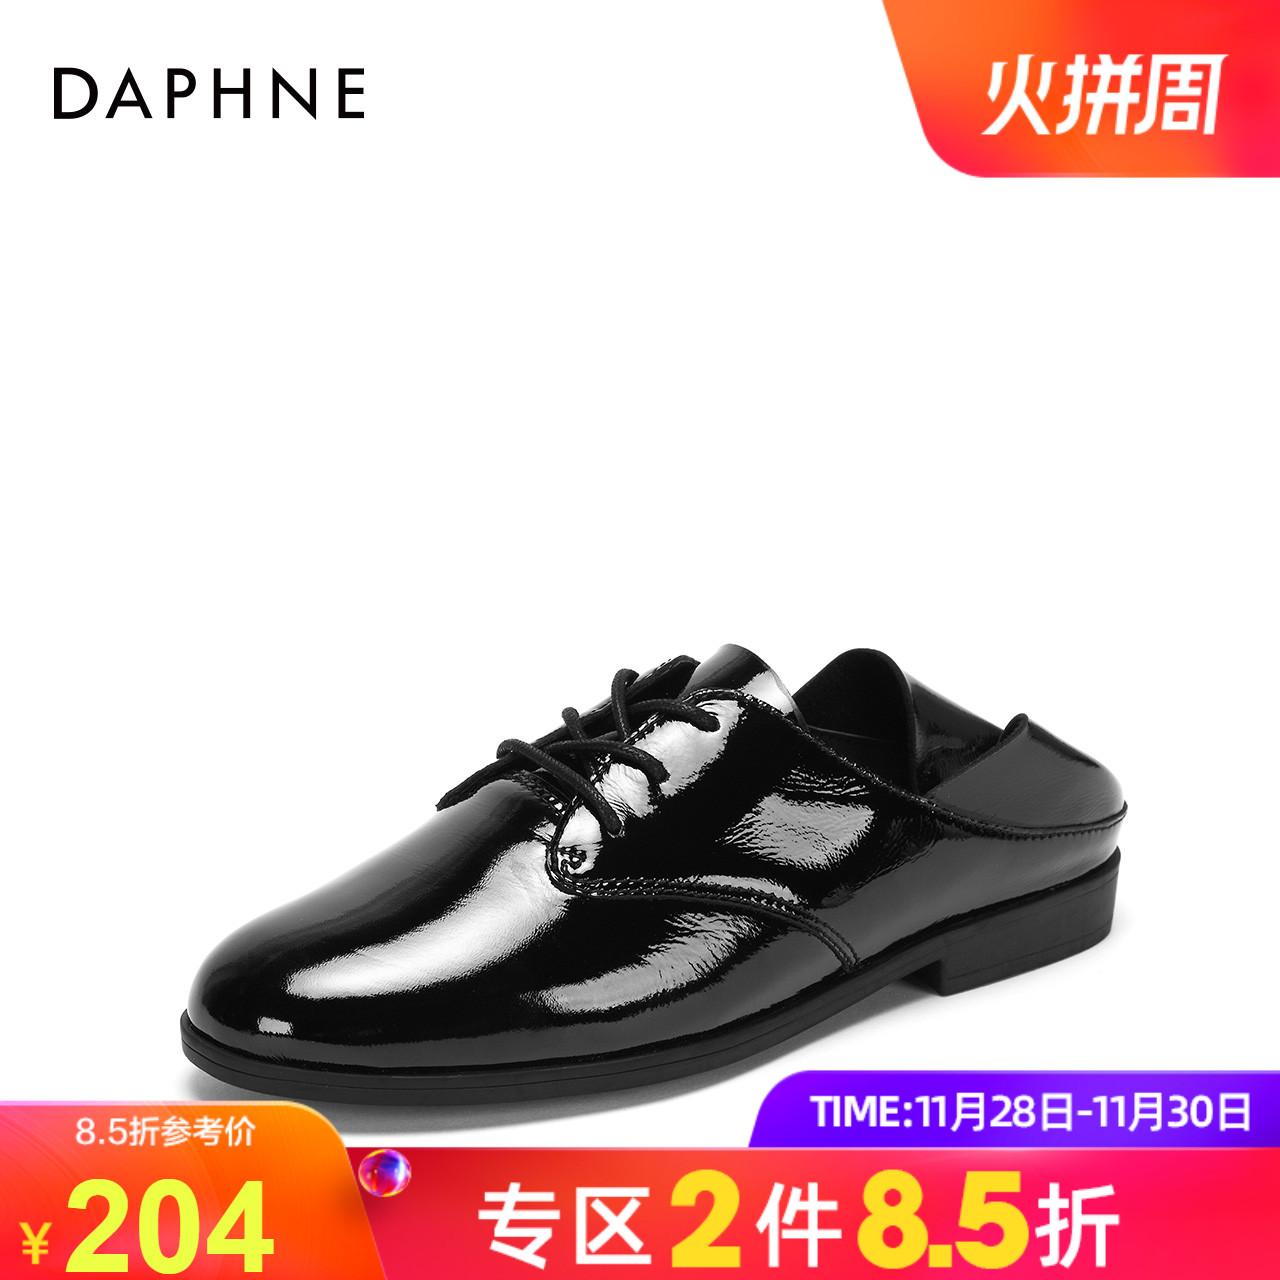 Daphne/达芙妮秋新款牛皮圆头学院风时尚系带平跟单鞋女